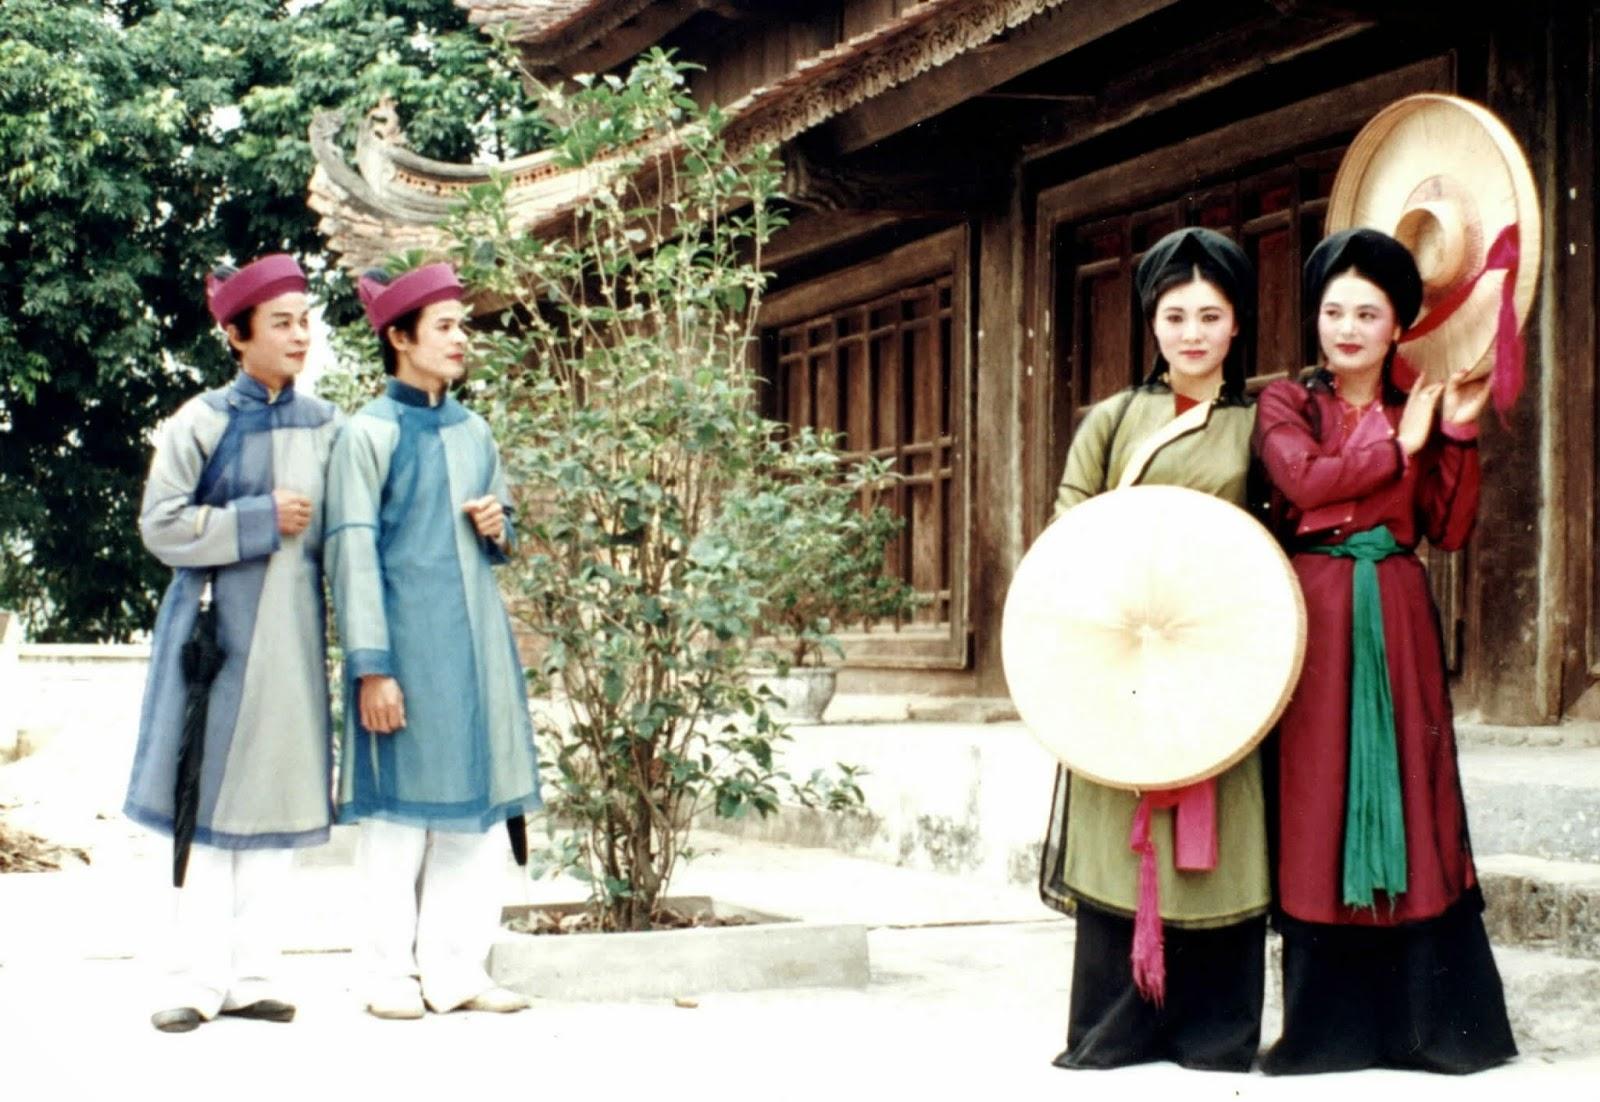 Quan ho Bac Ninh folk songs - INTANGIBLE CULTURAL HERITAGE